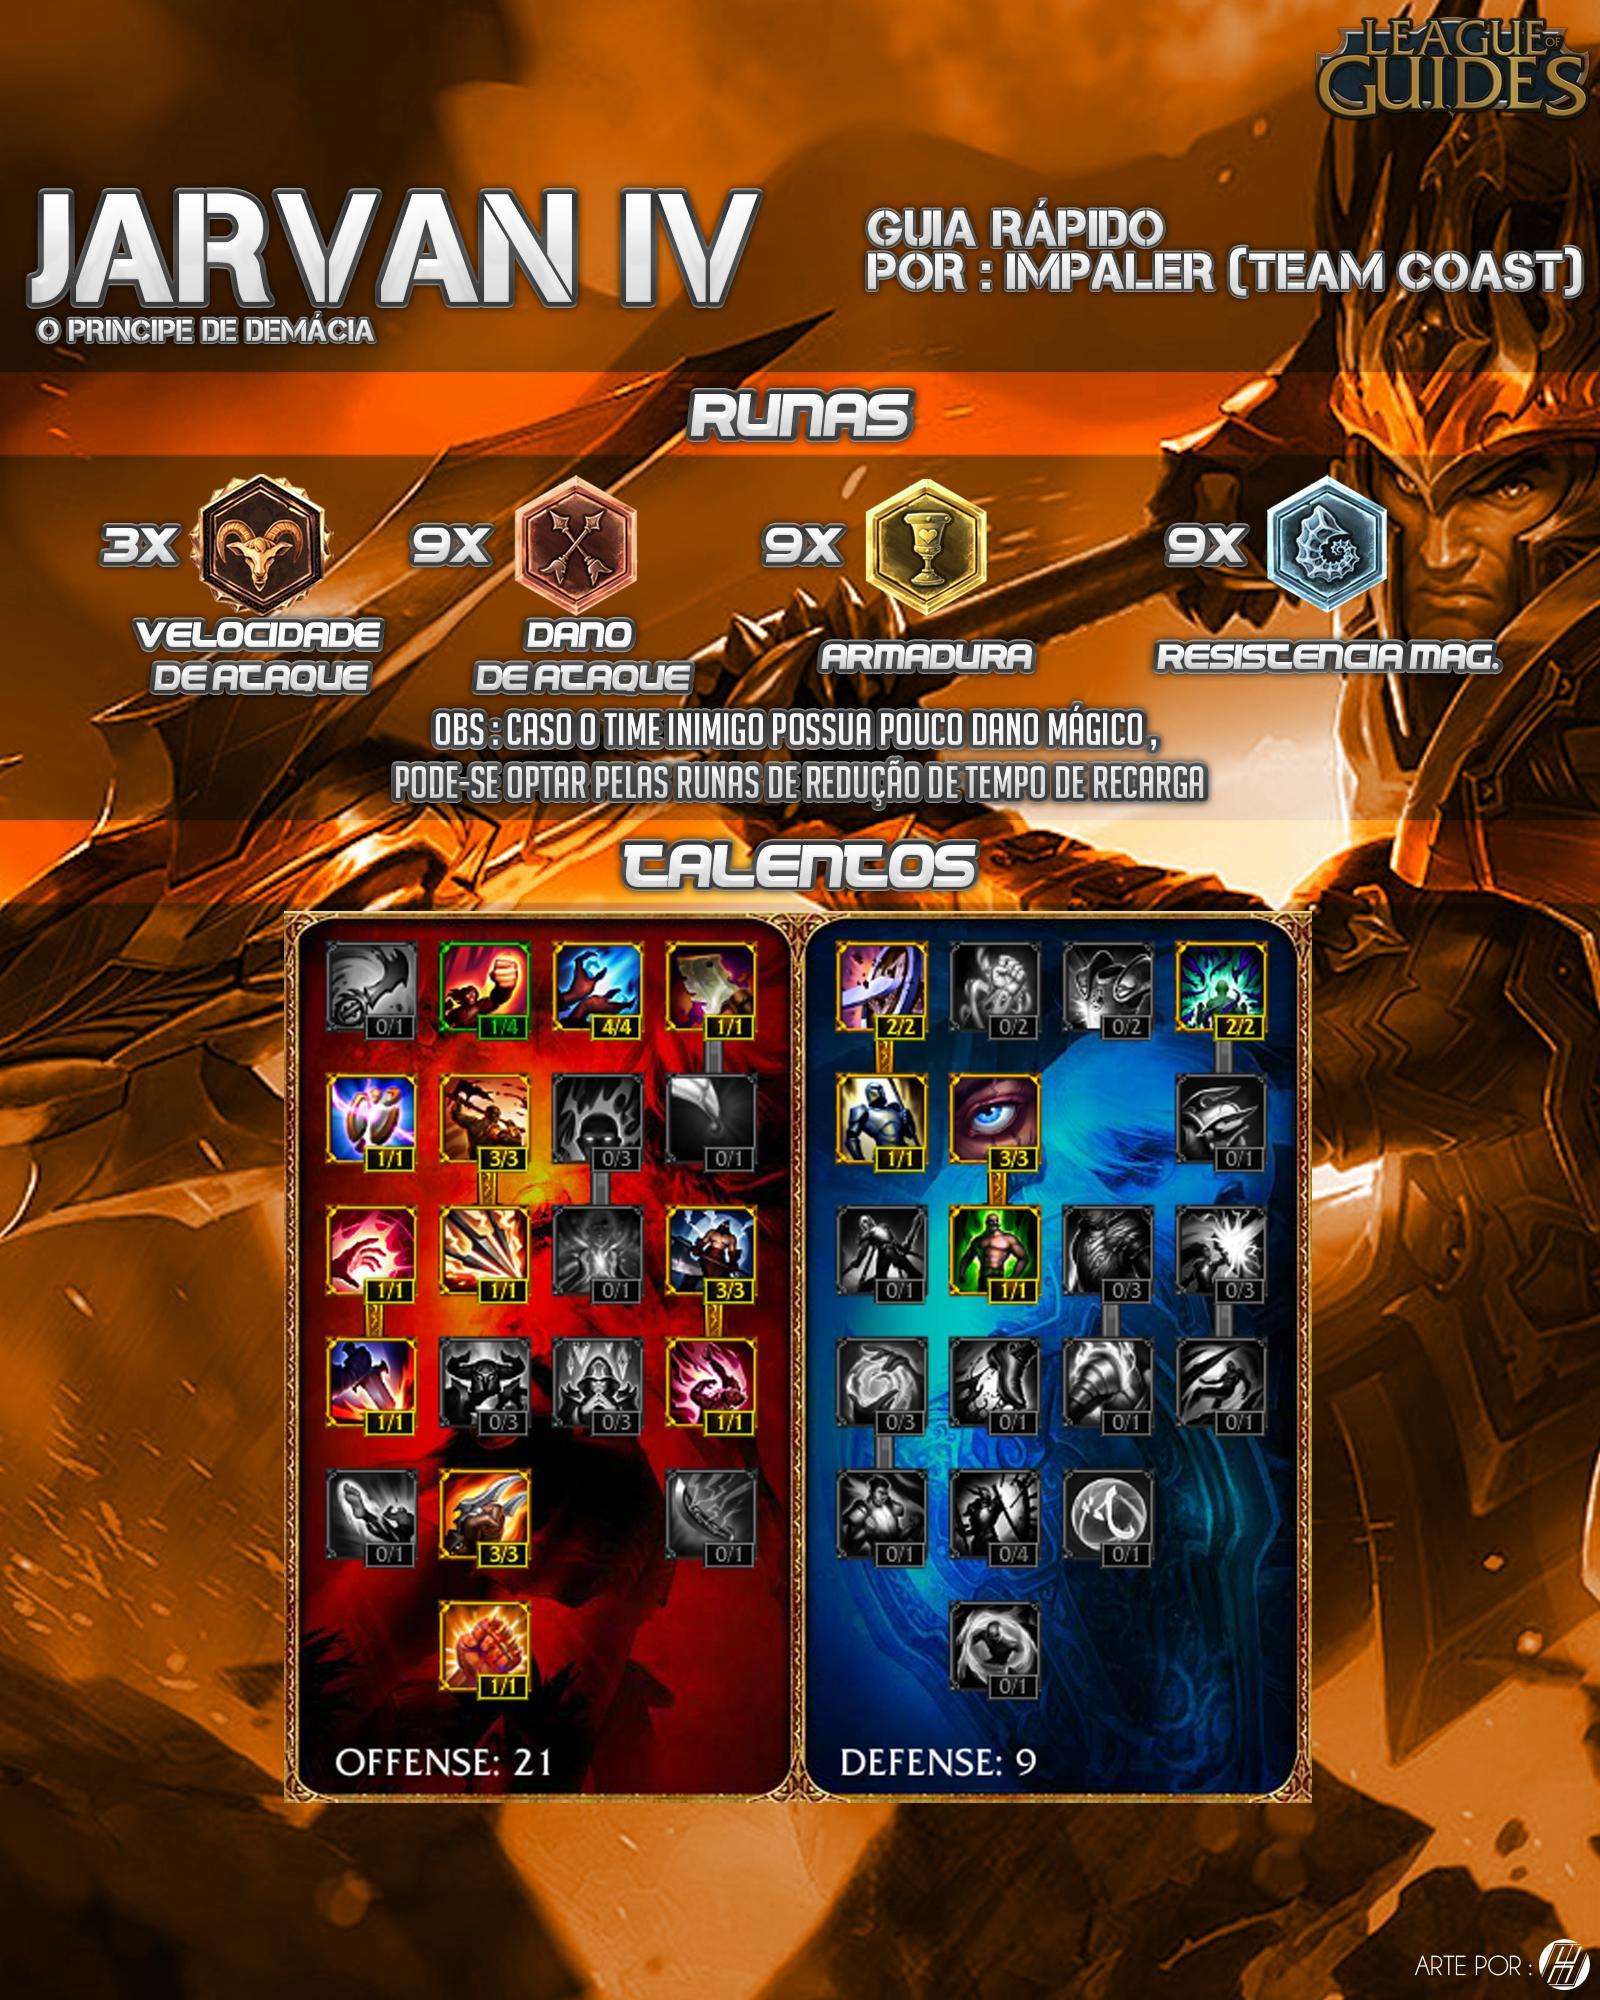 Guia - Jarvan IV